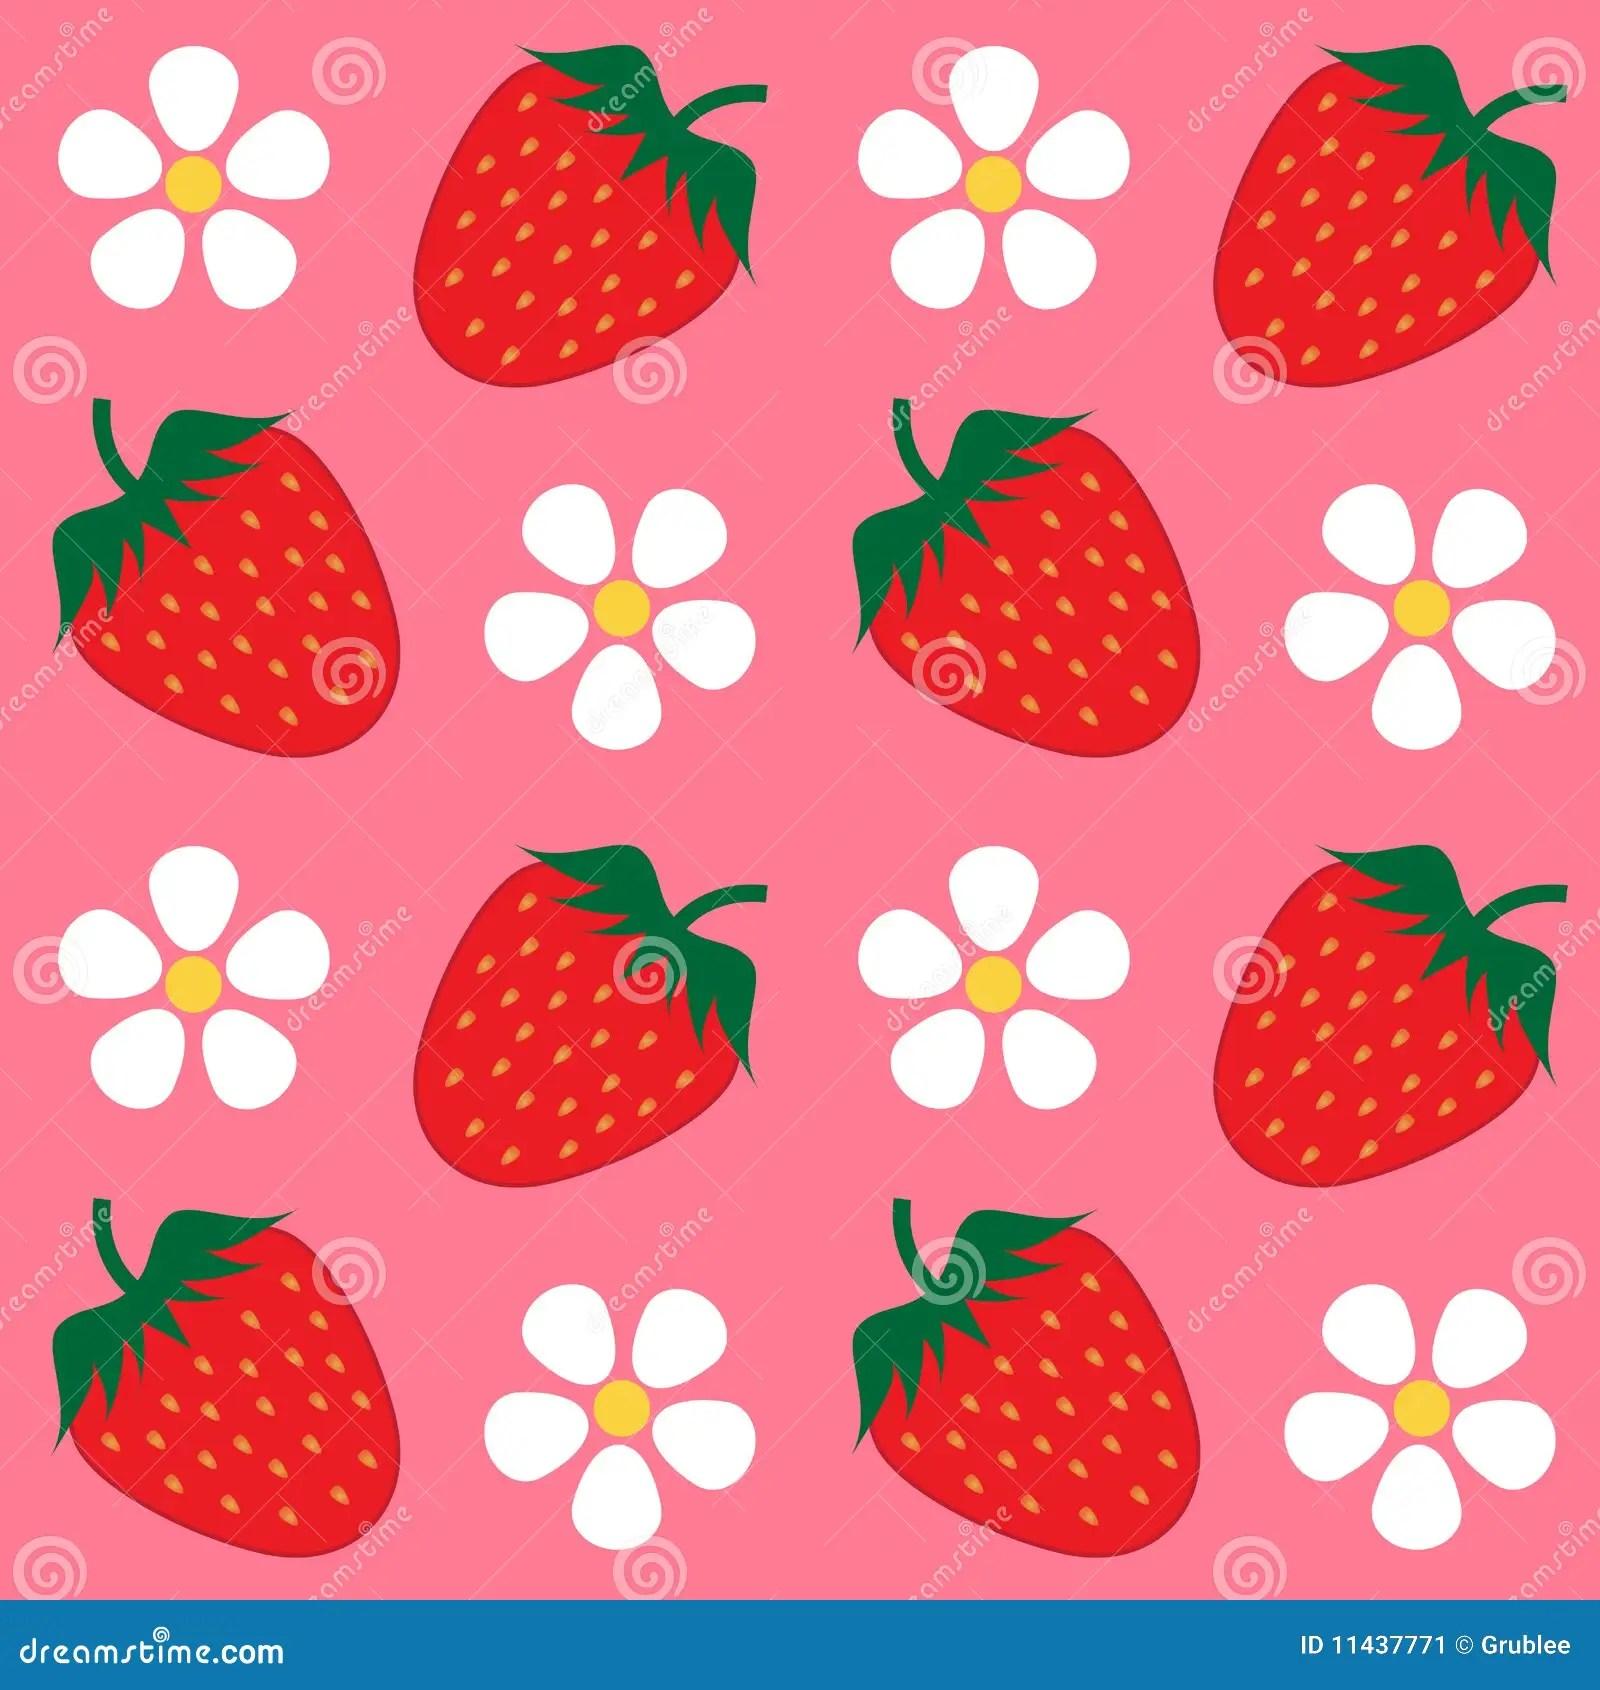 Cute Cartoon Flower Wallpaper Strawberry Wallpaper Background Stock Vector Image 11437771